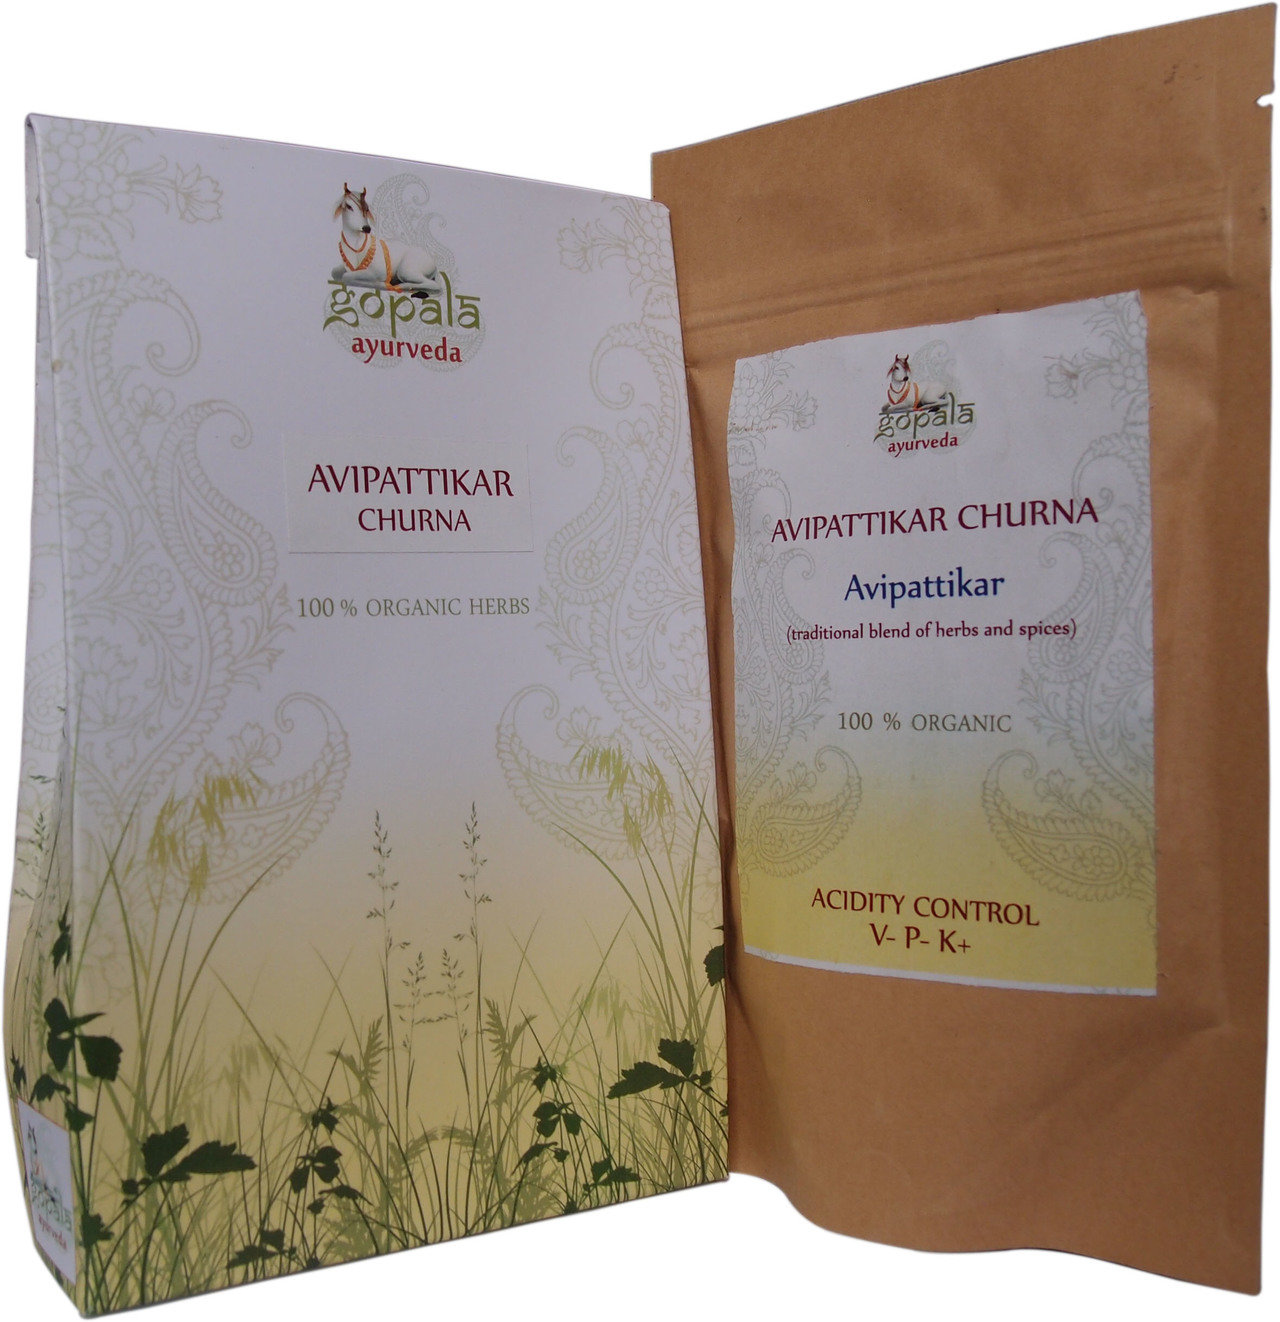 Gopala Avipattikar Capsules (108Vcaps) - 100% Certified Organic